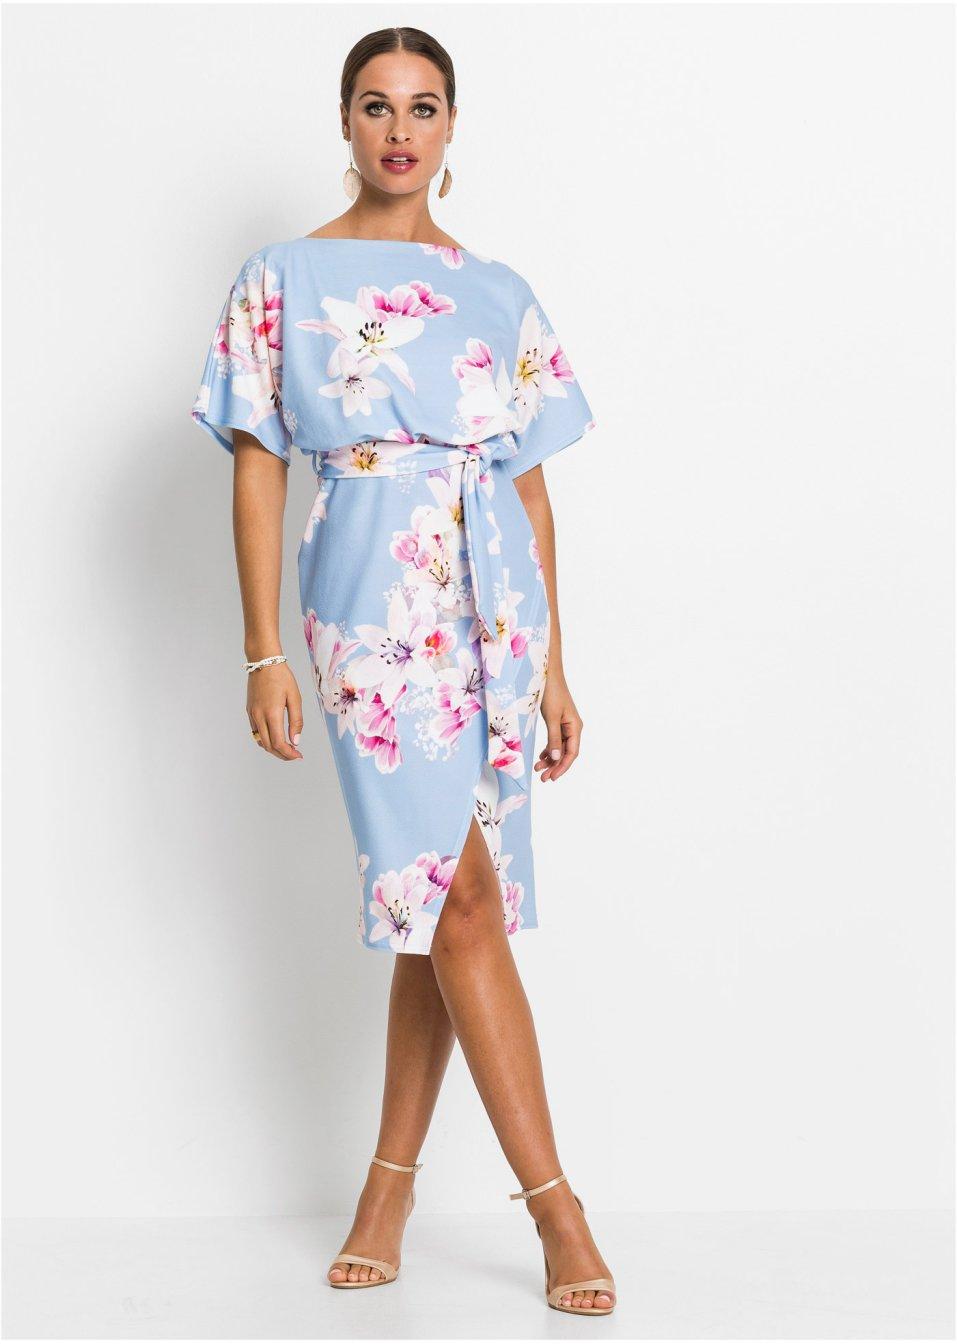 Kleid mit Wickeleffekt hellblau/rosa geblümt - BODYFLIRT ...